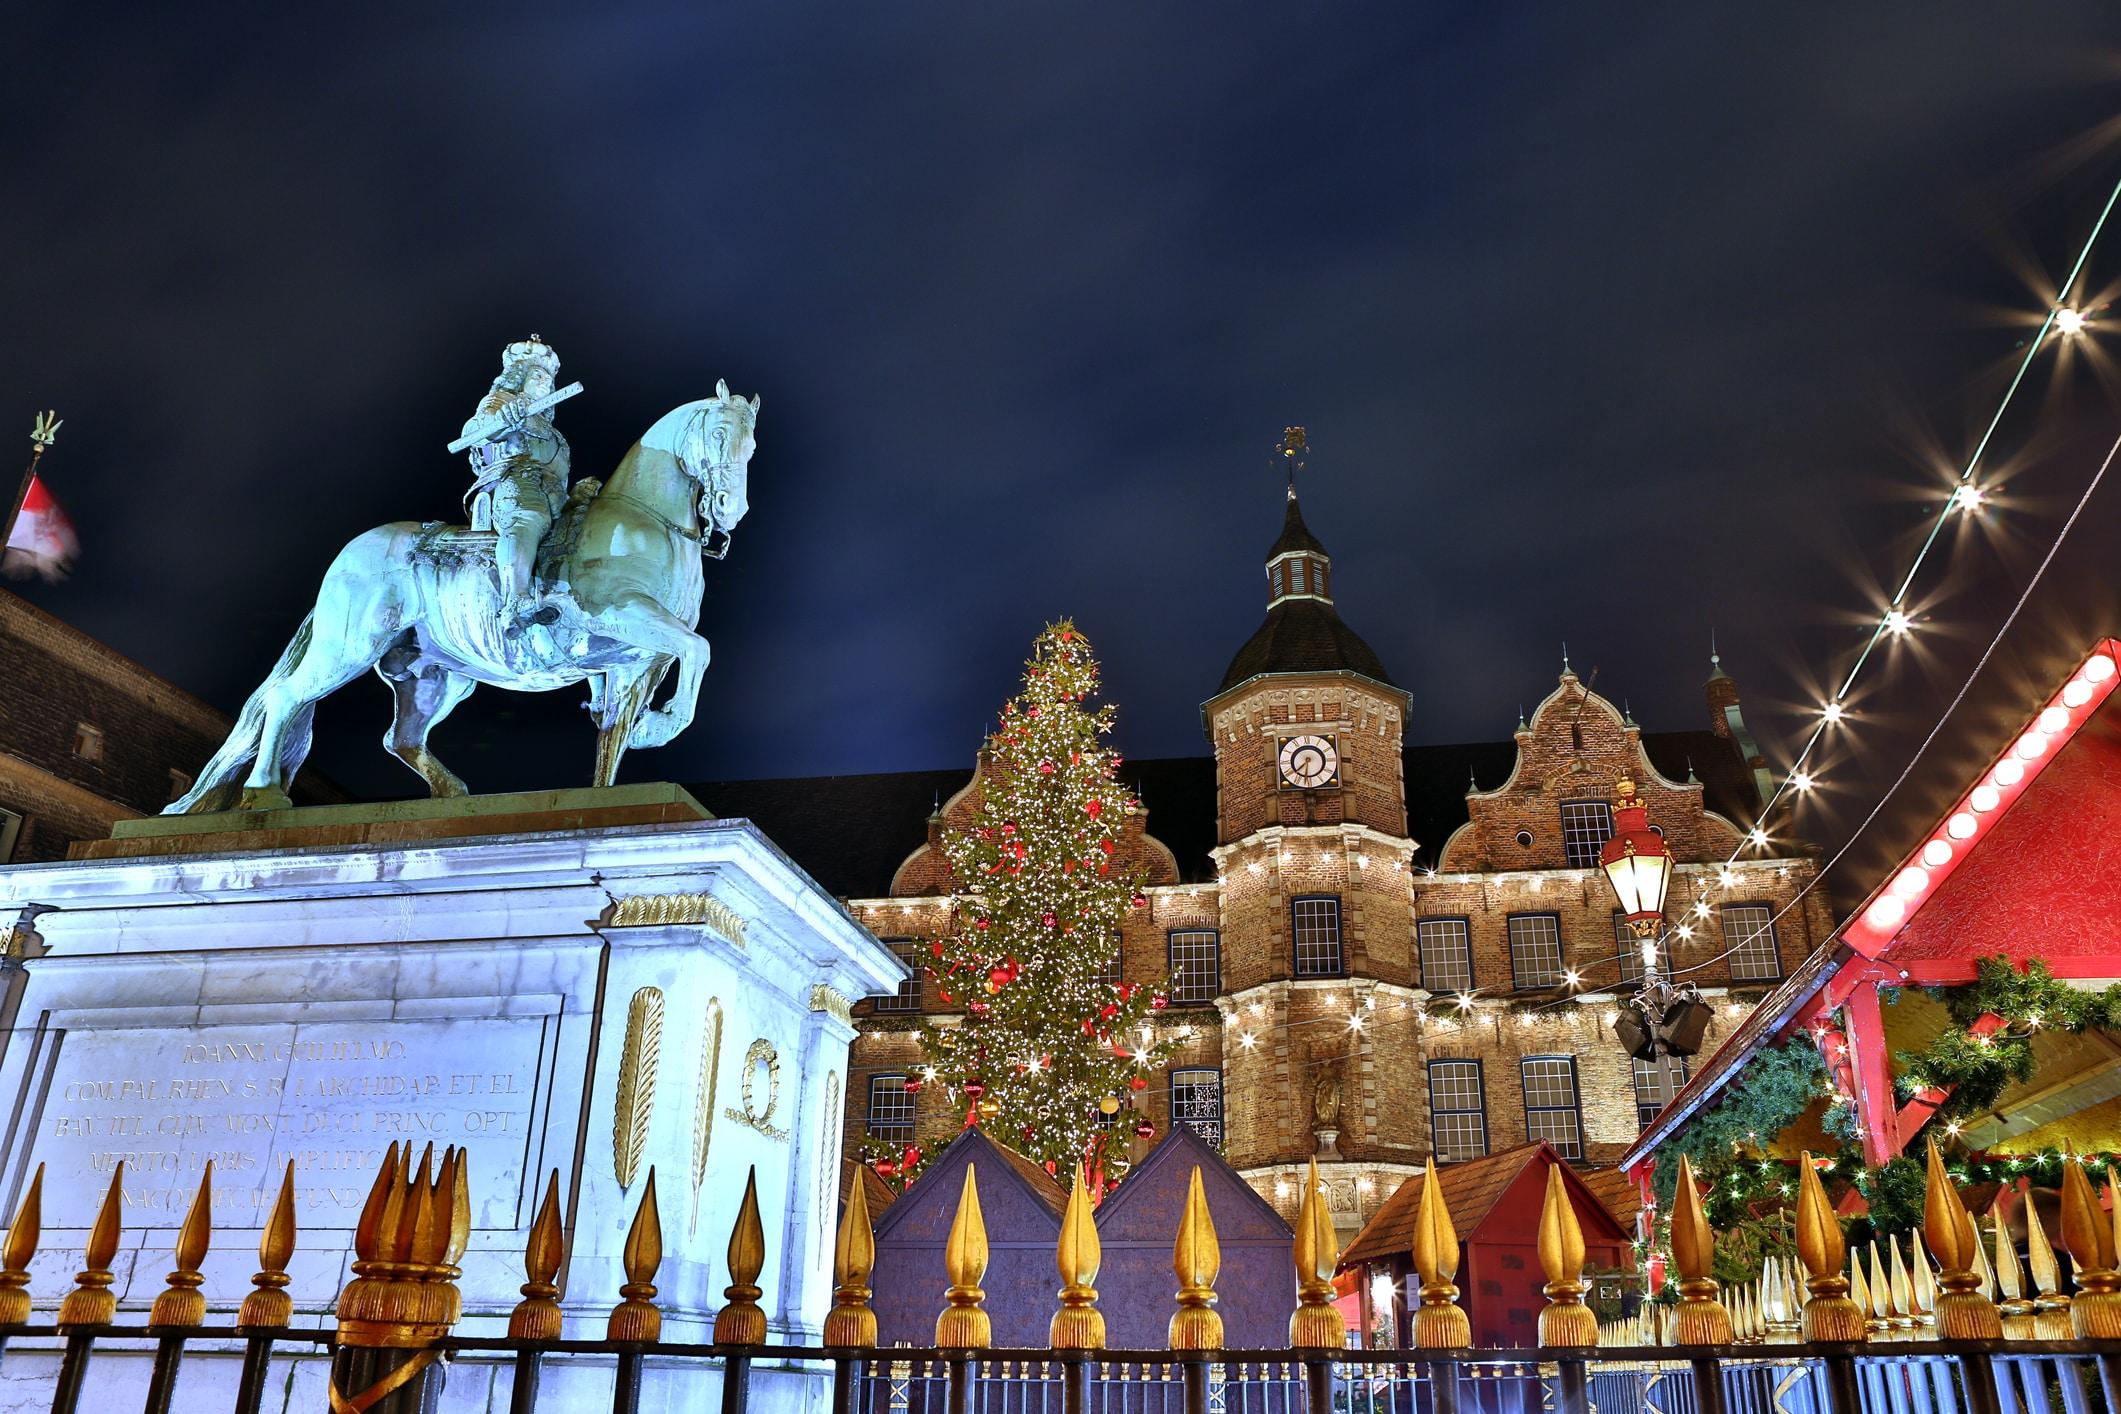 Kerstmarkt in Düsseldorf, Duitsland